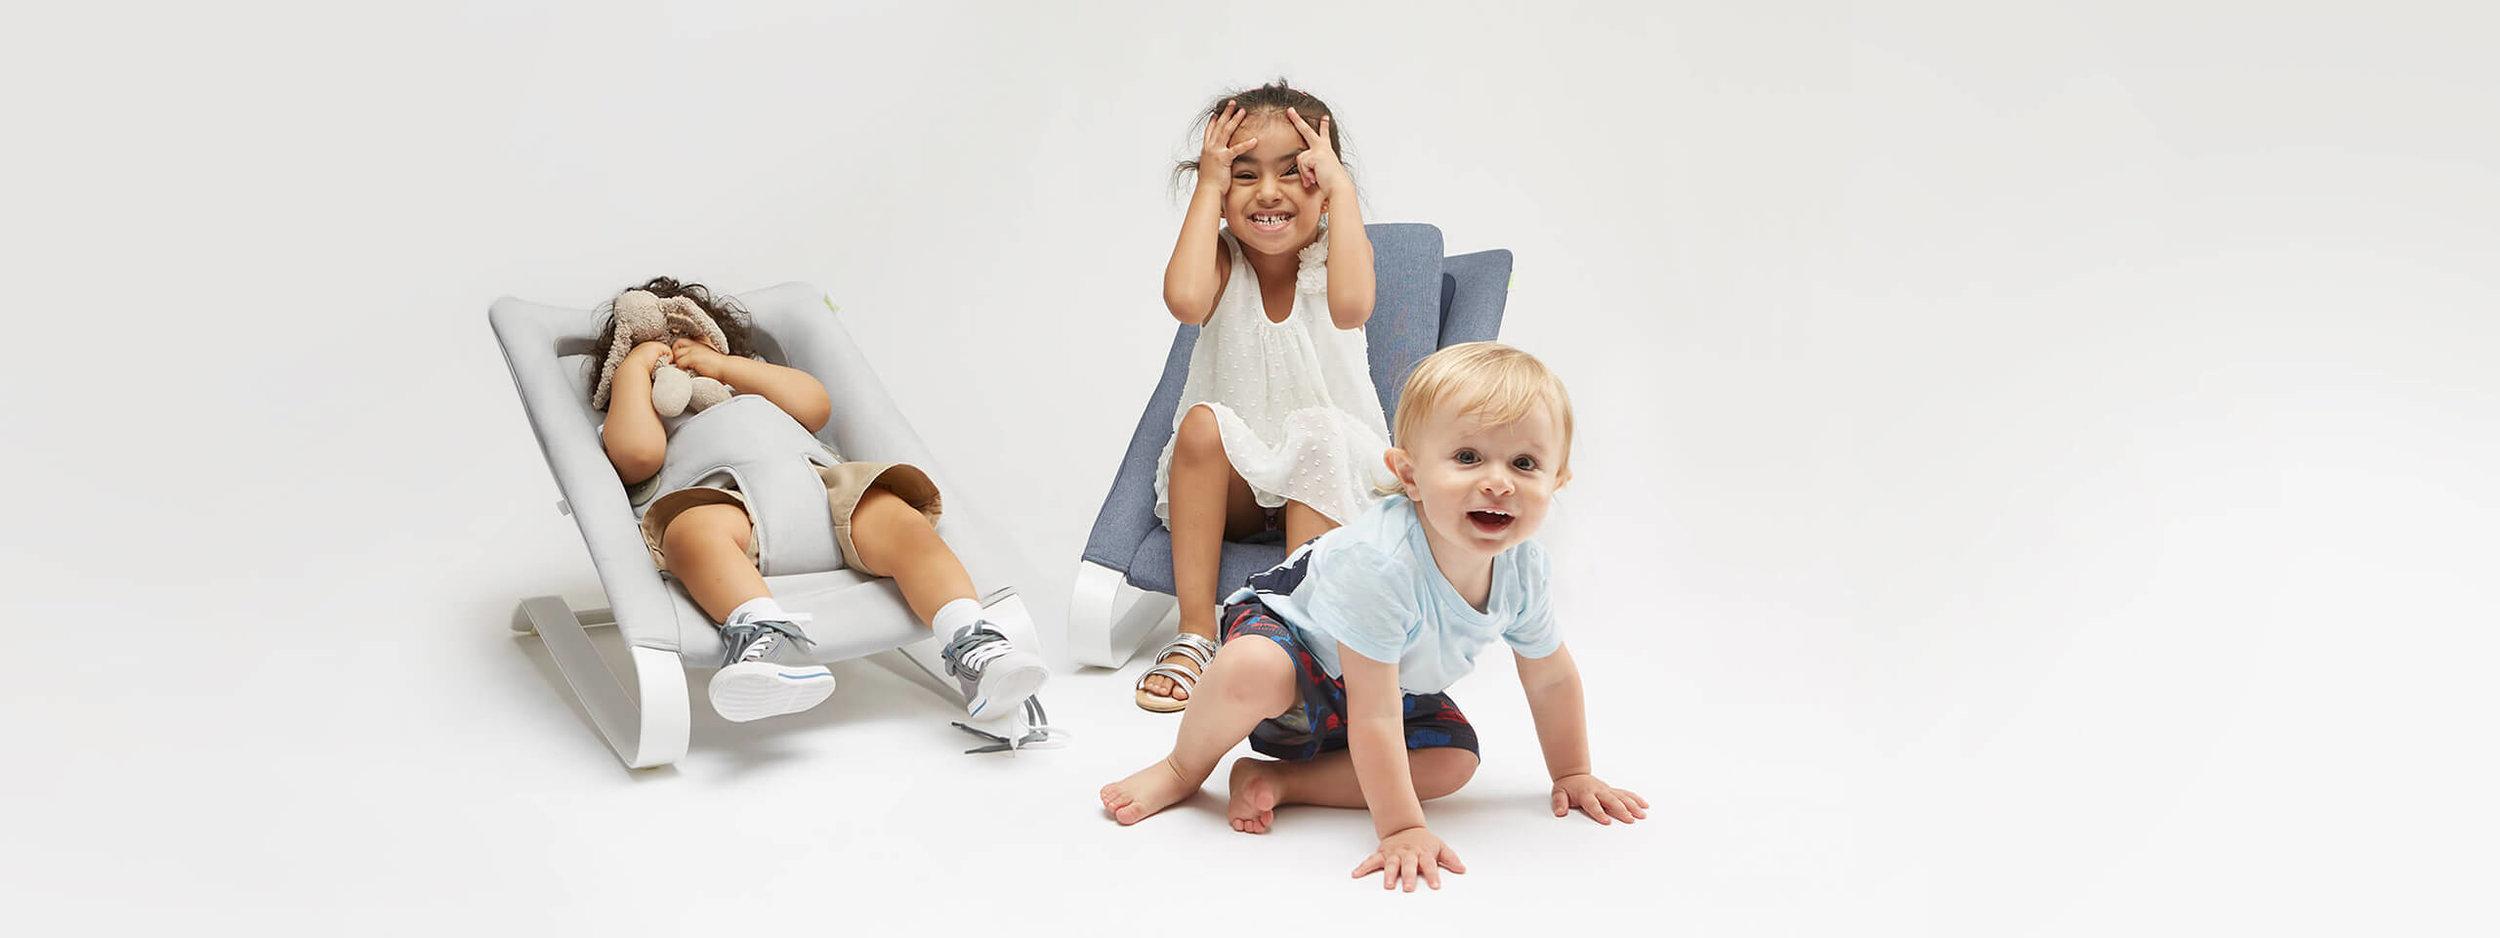 Bombol-Bamboo-baby-bouncer-playing-kids.jpg